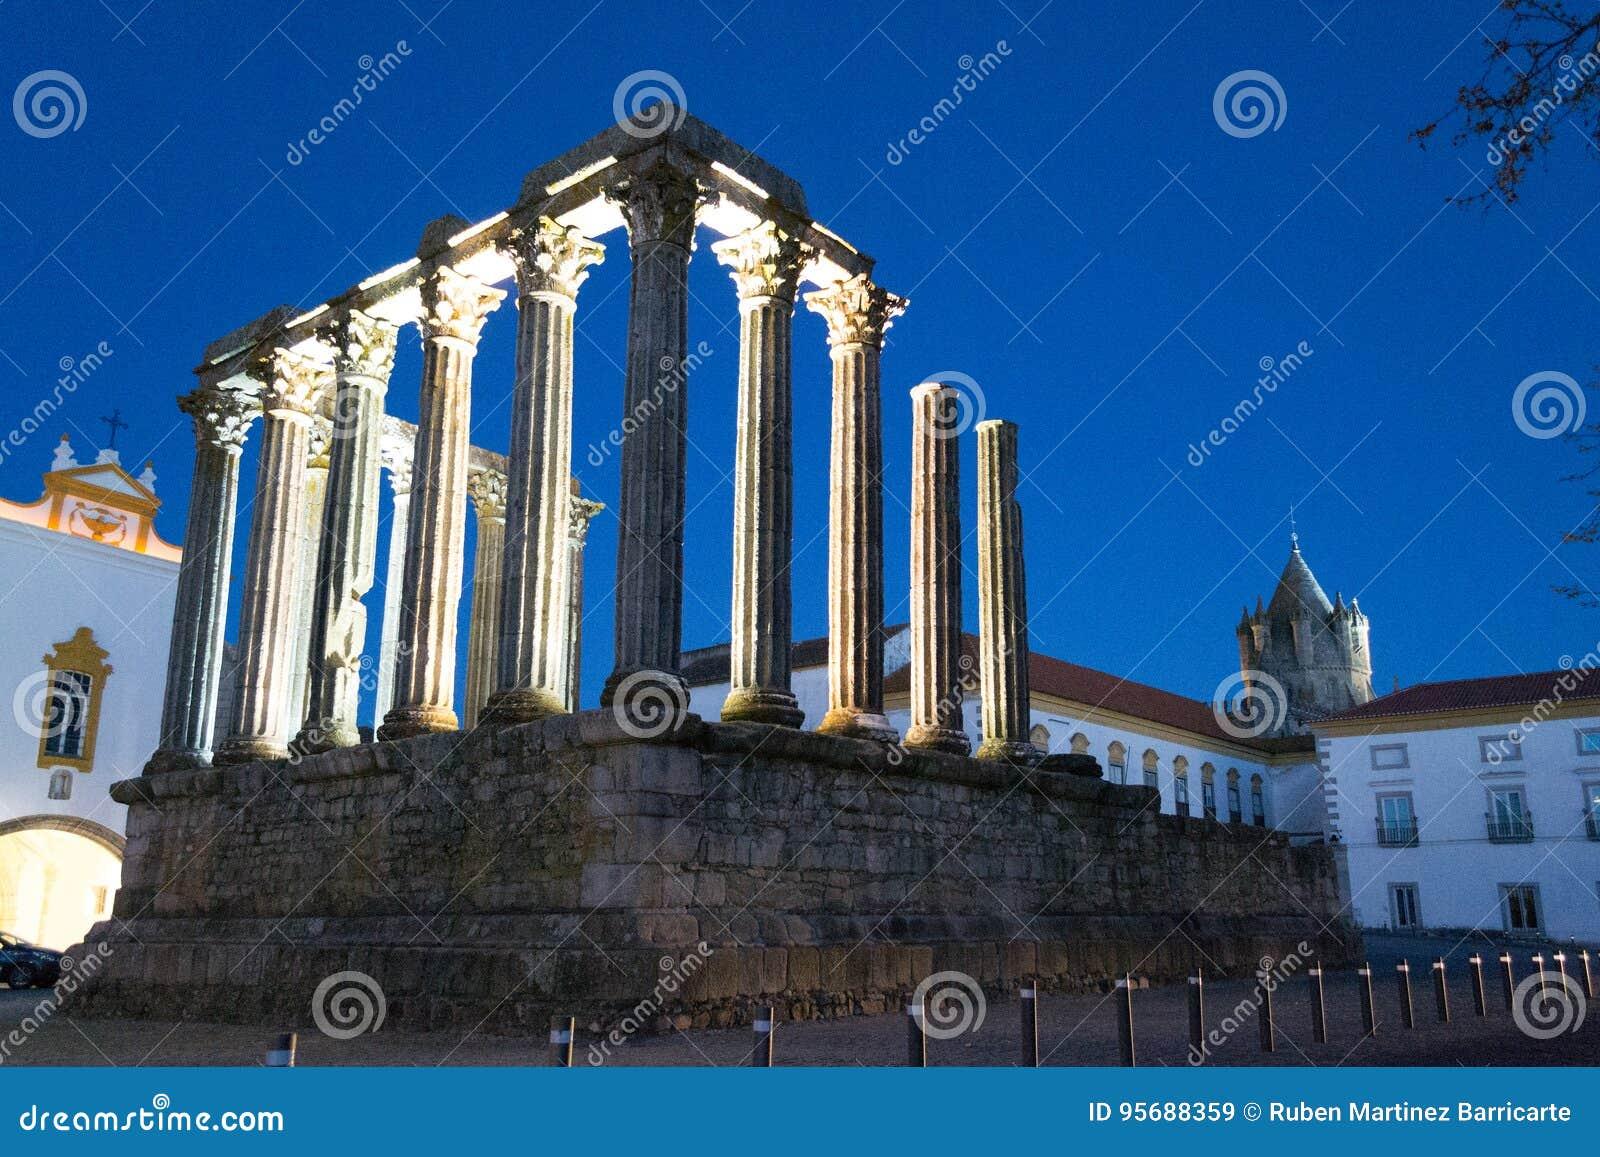 Night picture of the roman temple of Evora (Portugal).